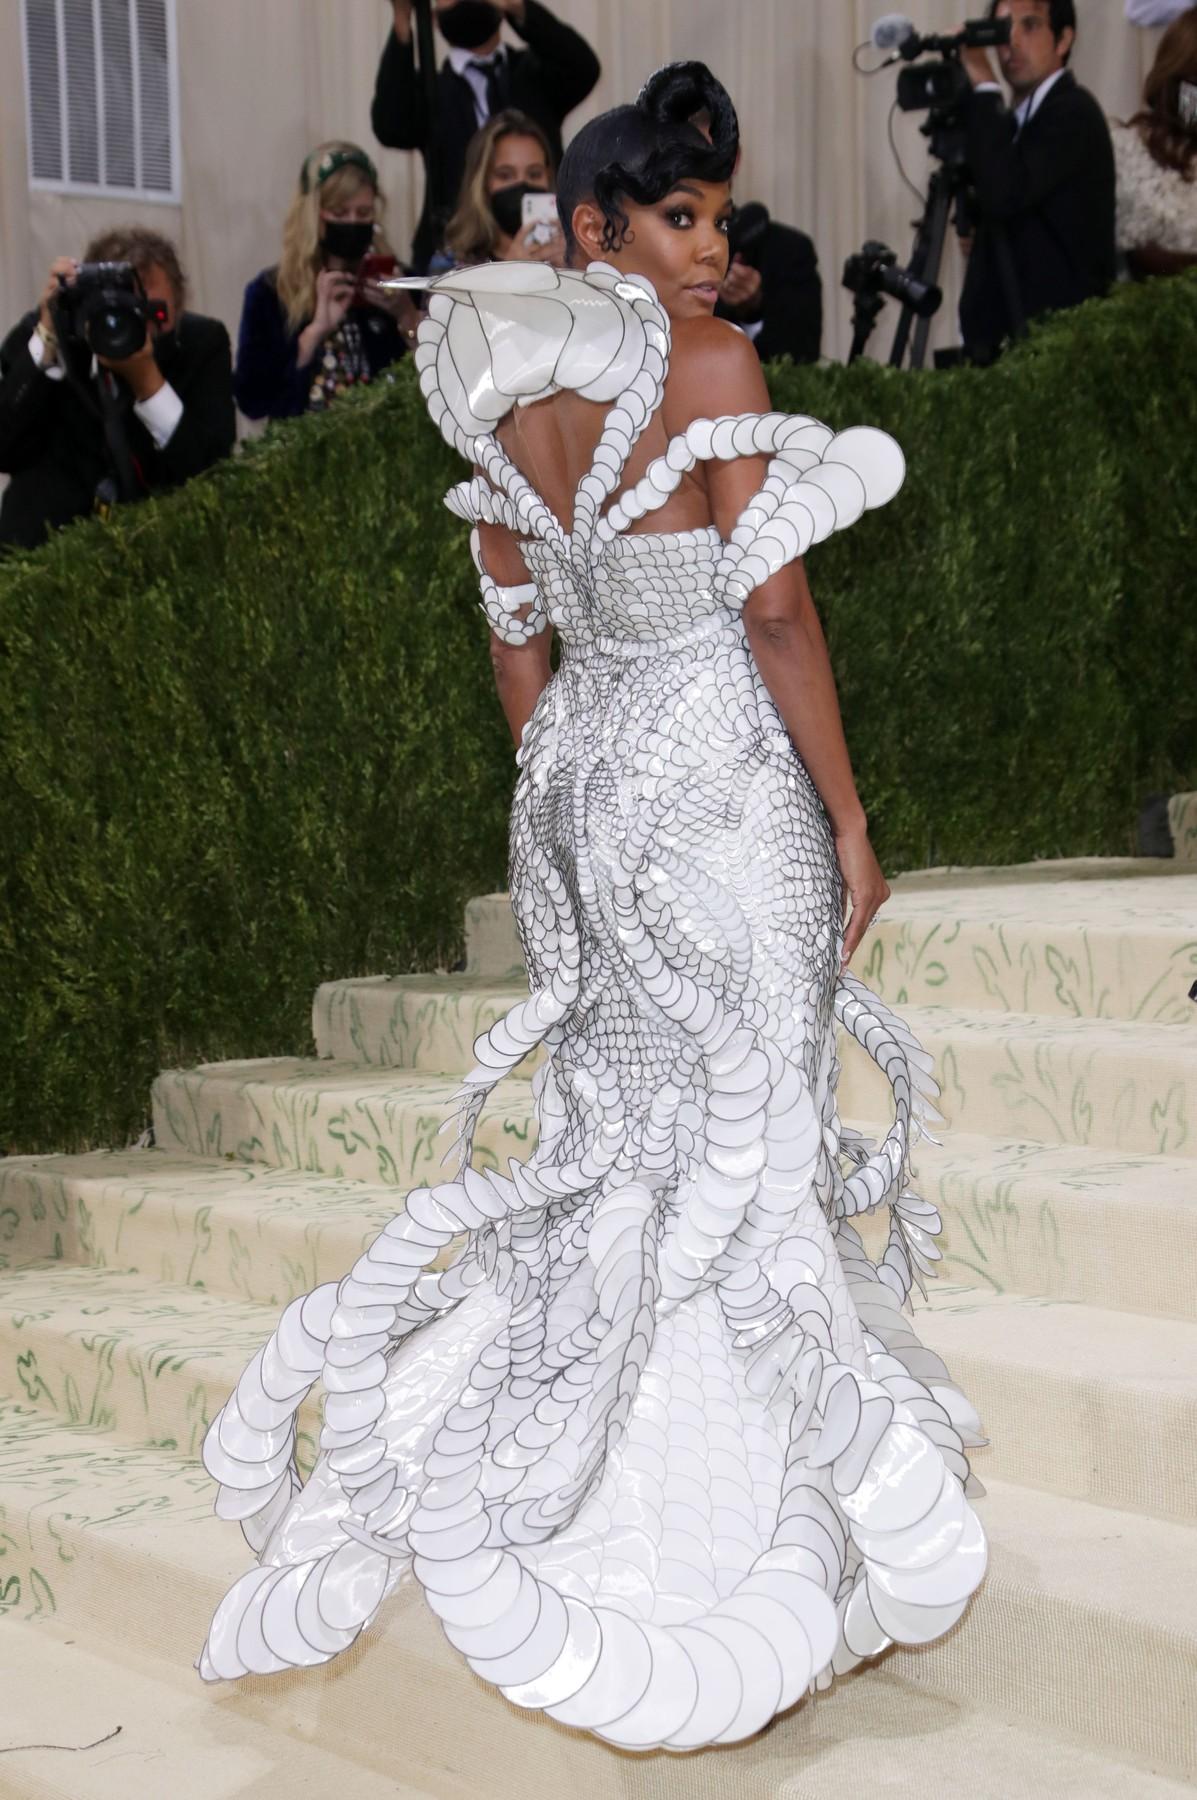 Gabrielle Union, Met Gala FOTO: Profimedia Images